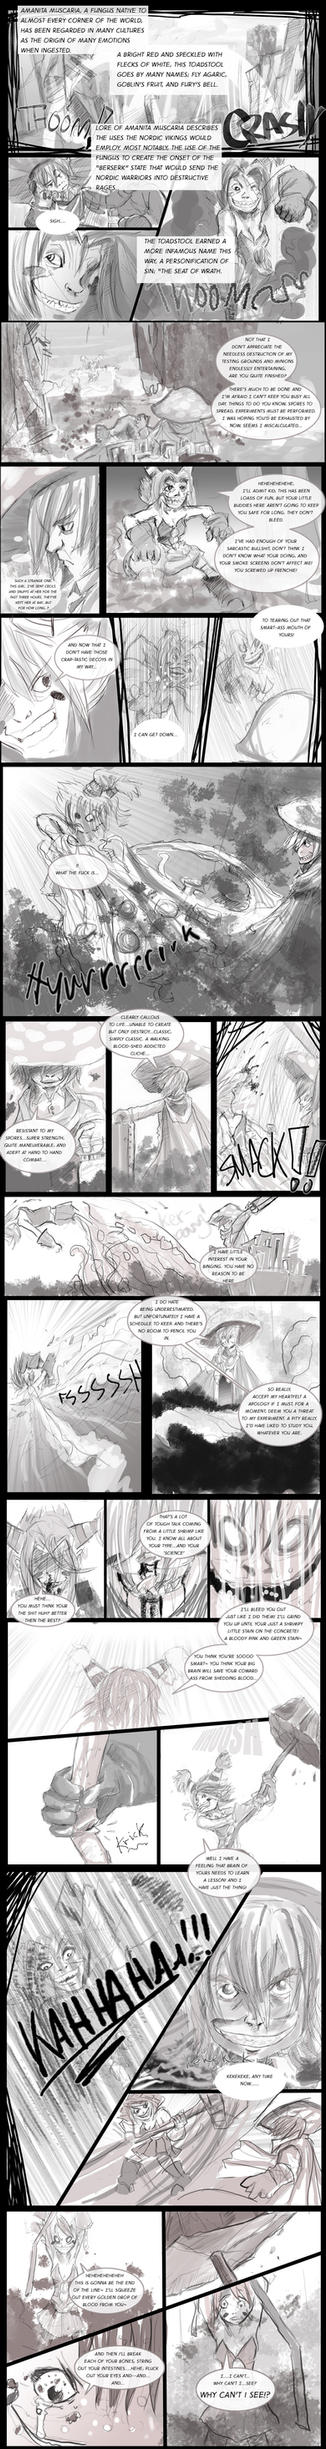 Deadline Rnd 1 .Vs Dandelion by Queen-and-Azriel